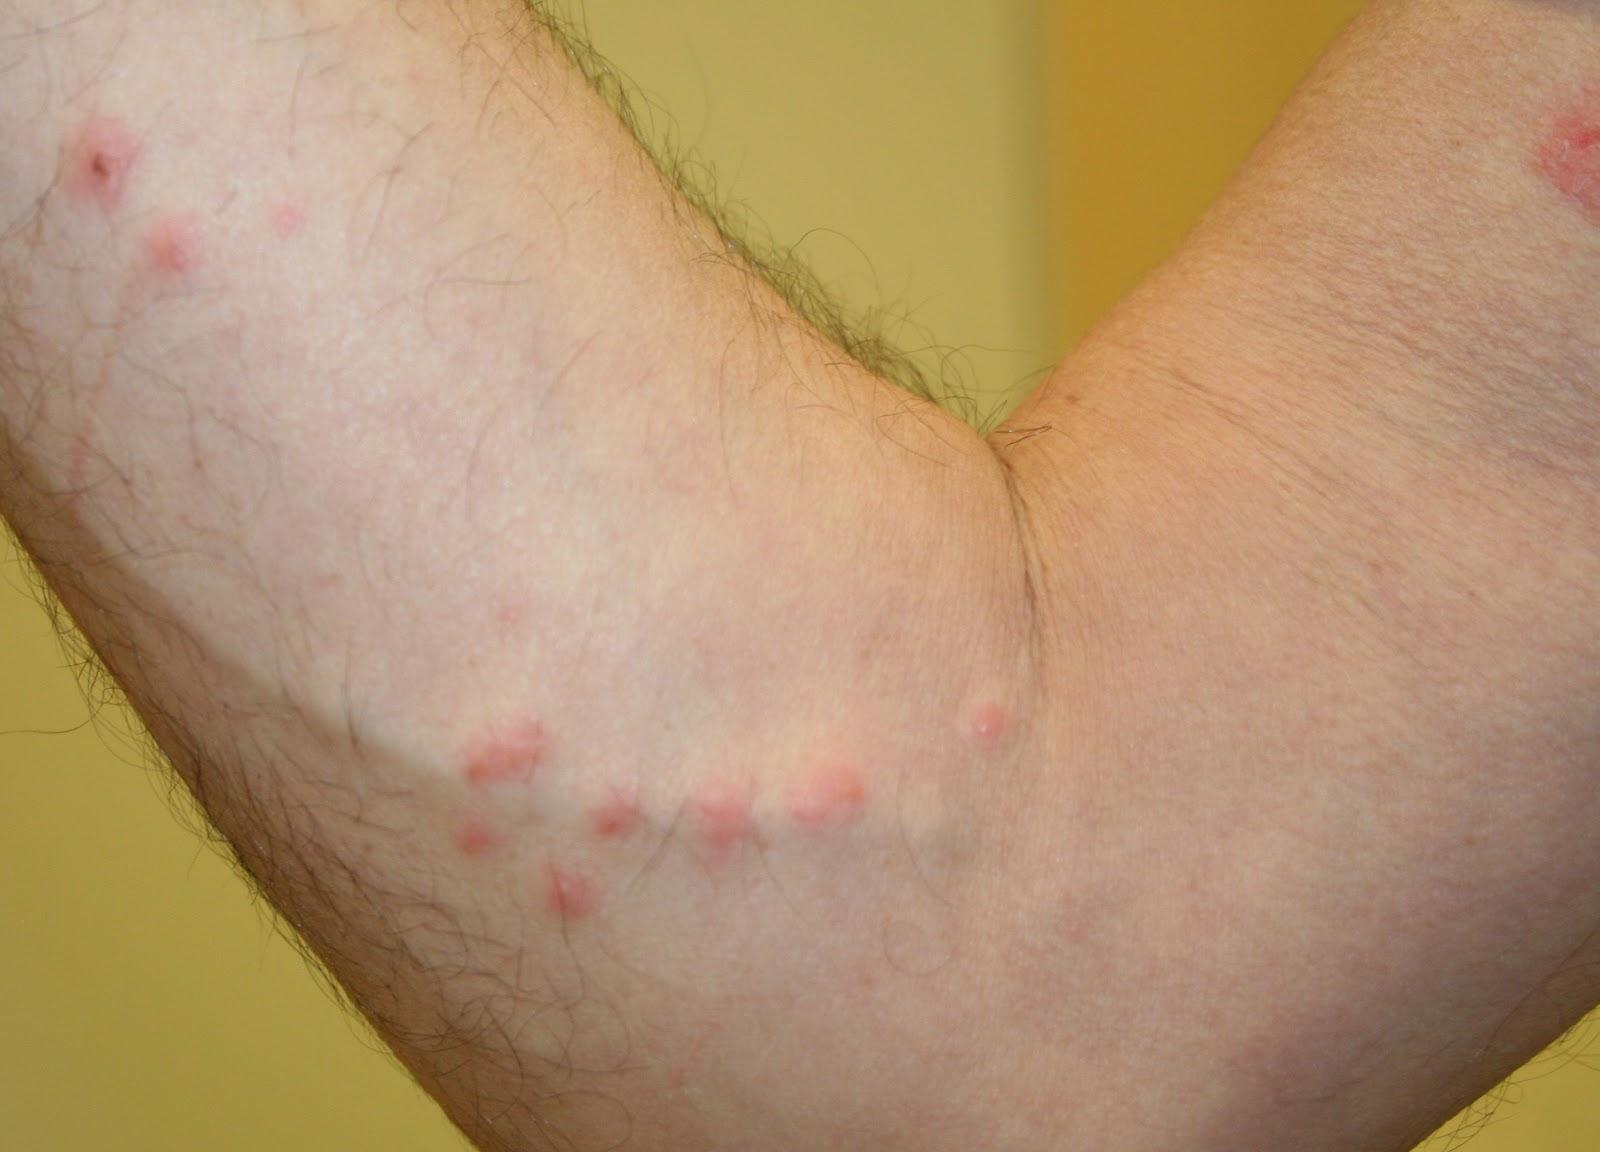 Linear bug bites - Doctor answers on HealthcareMagic